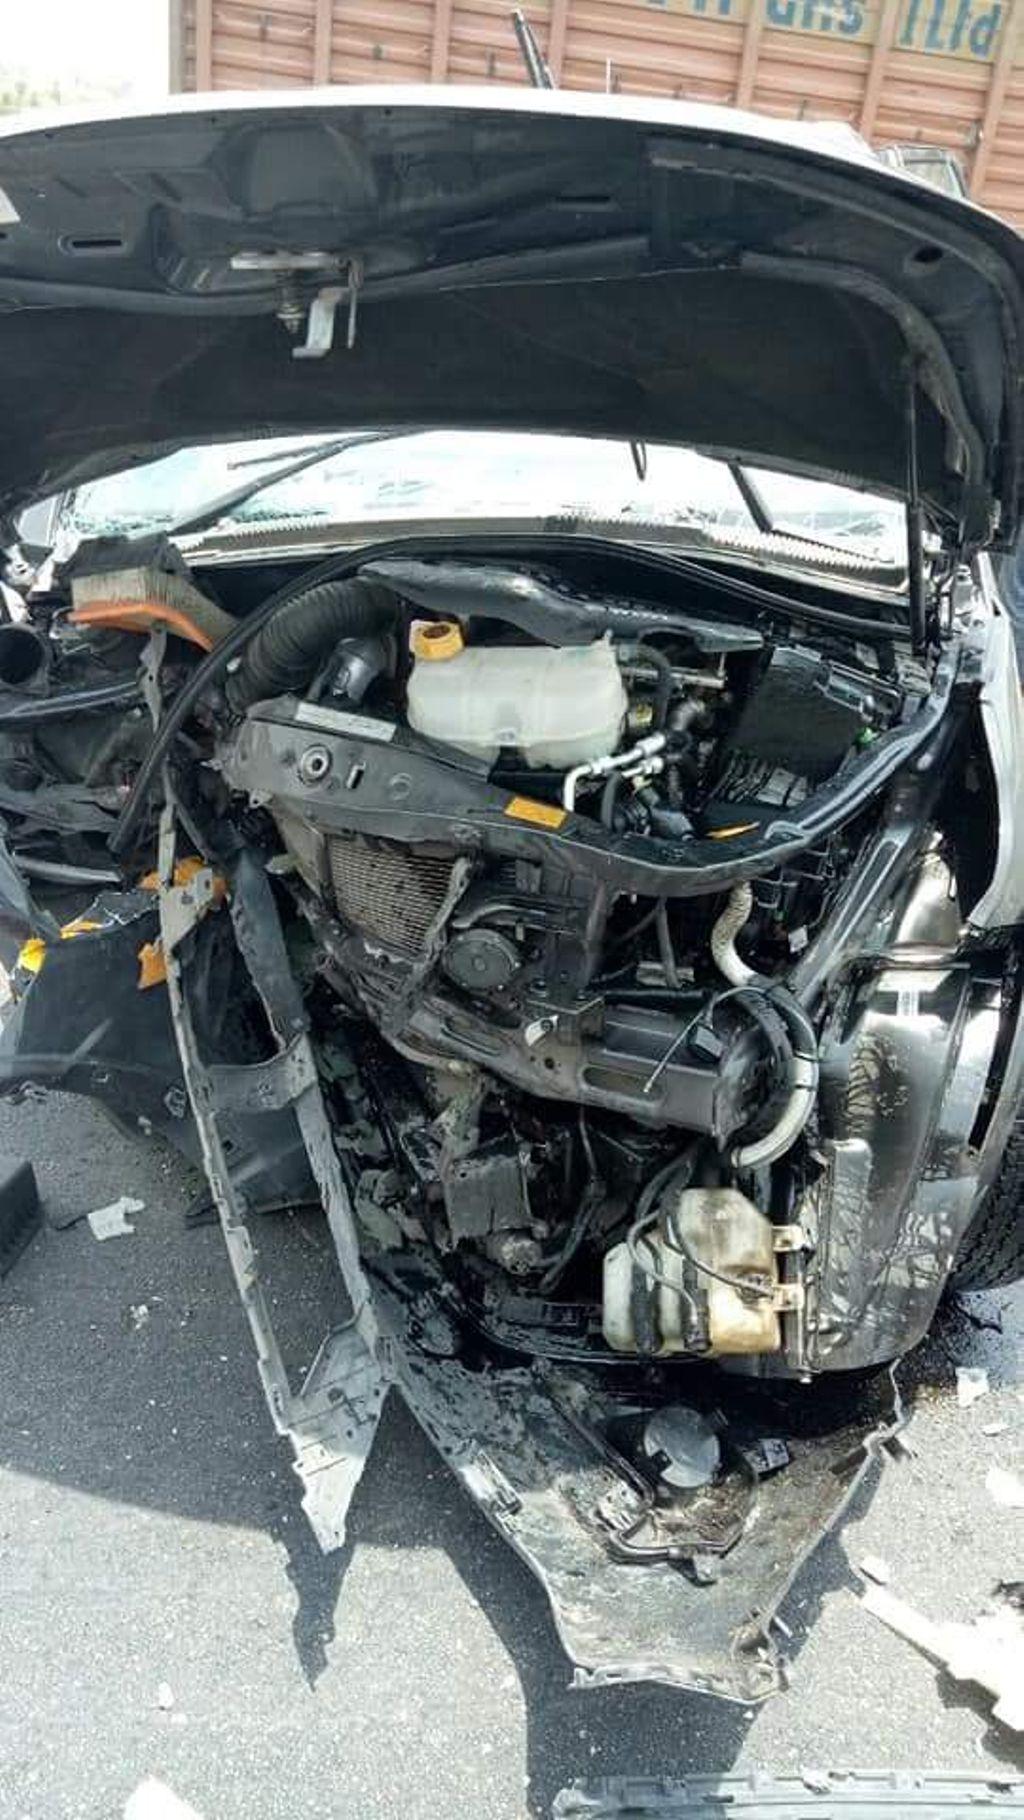 Tata-Hexa-crashed-on-highway-2